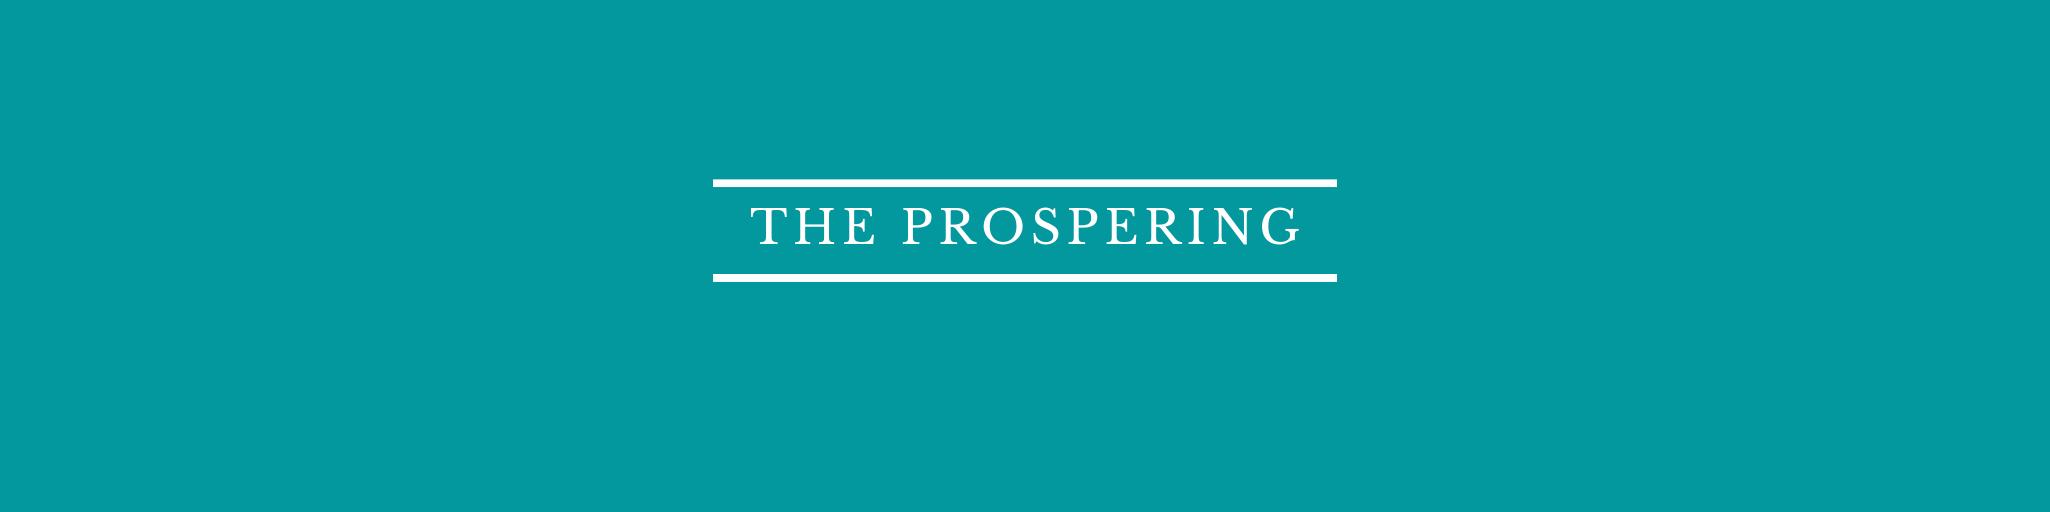 The Prospering